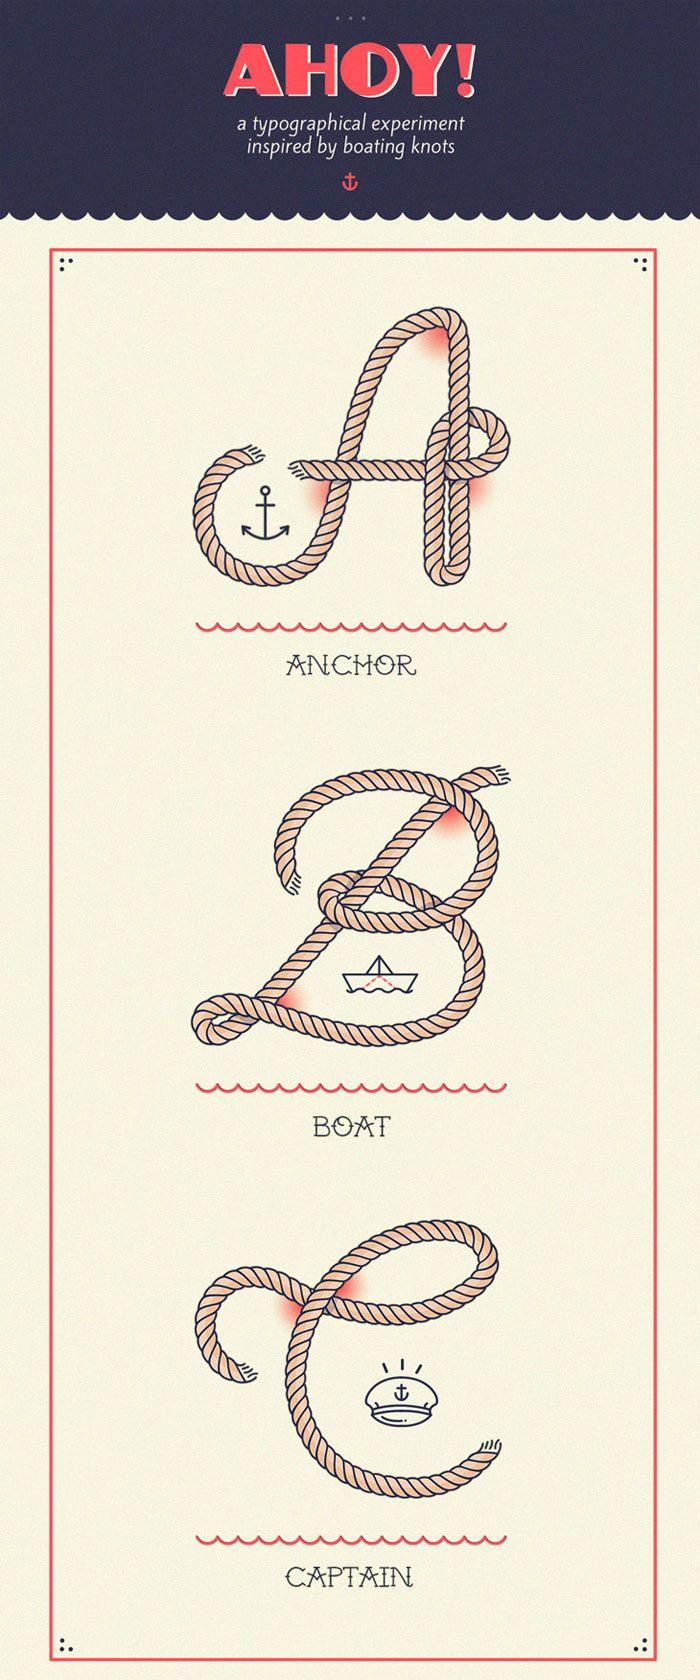 Lorena G / Hand-drawn type series